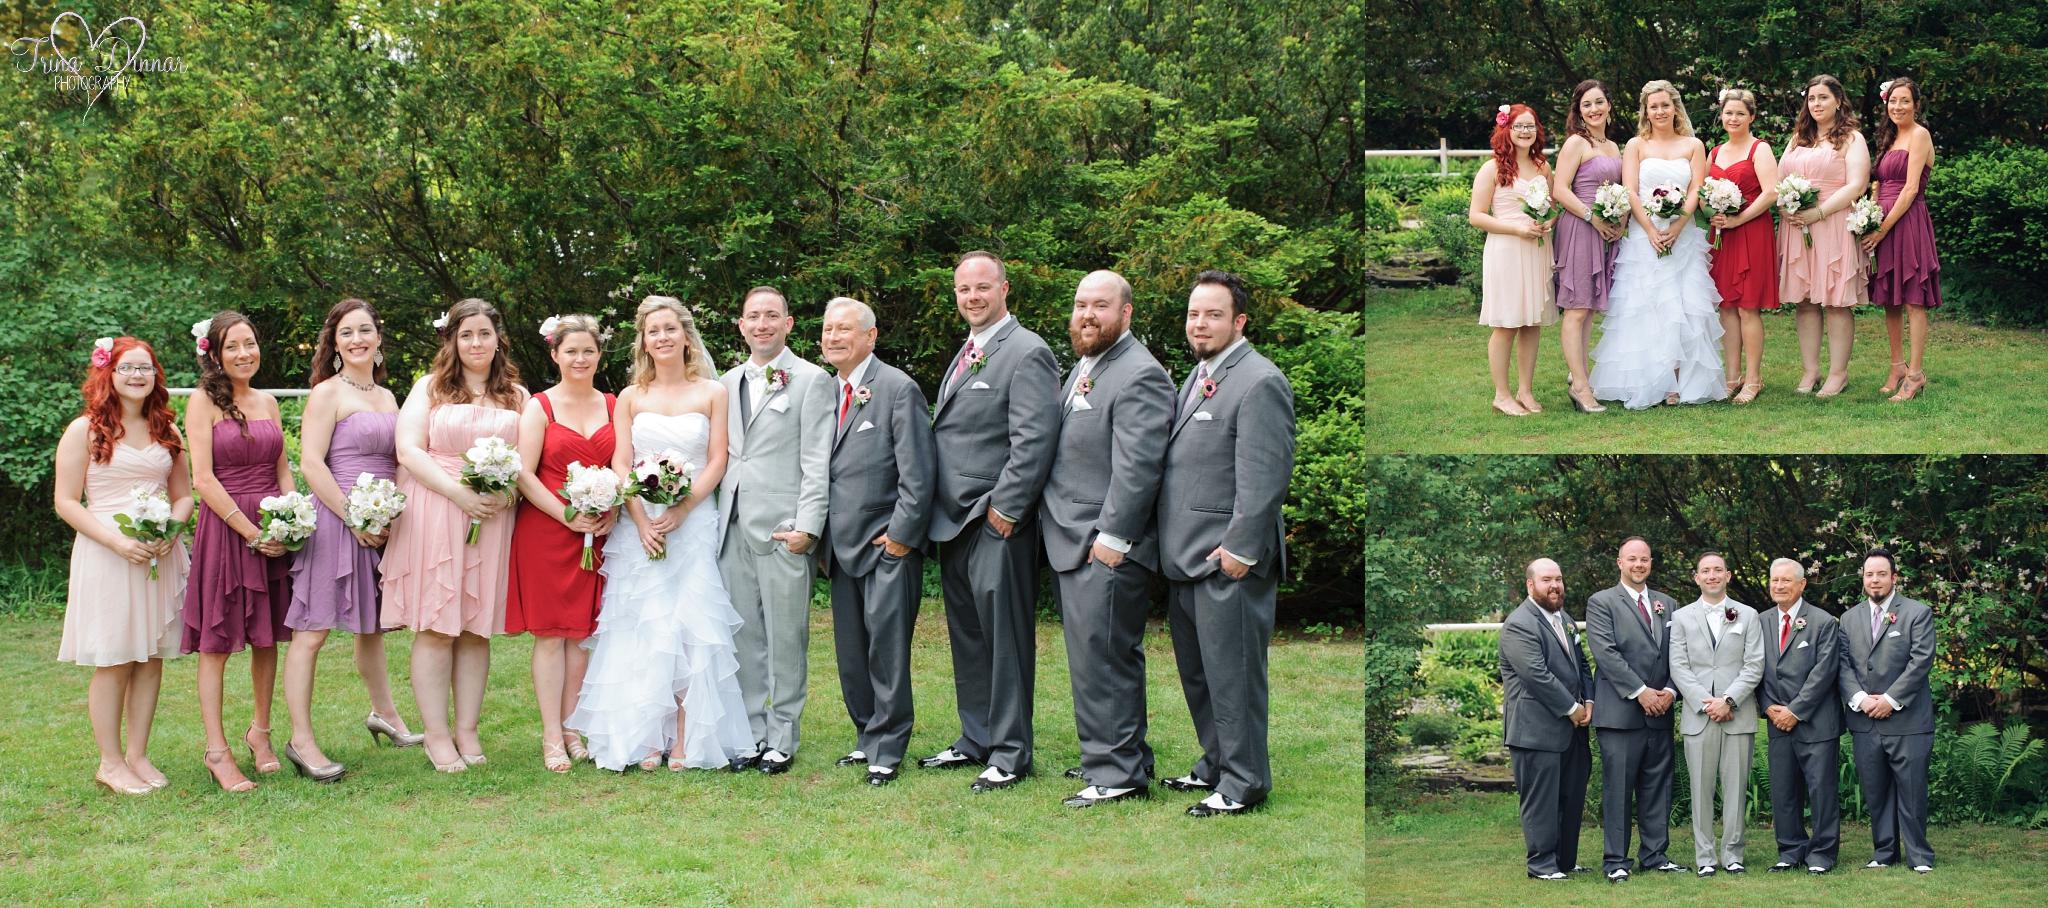 New Hampshire Wedding Bridal Party Photography